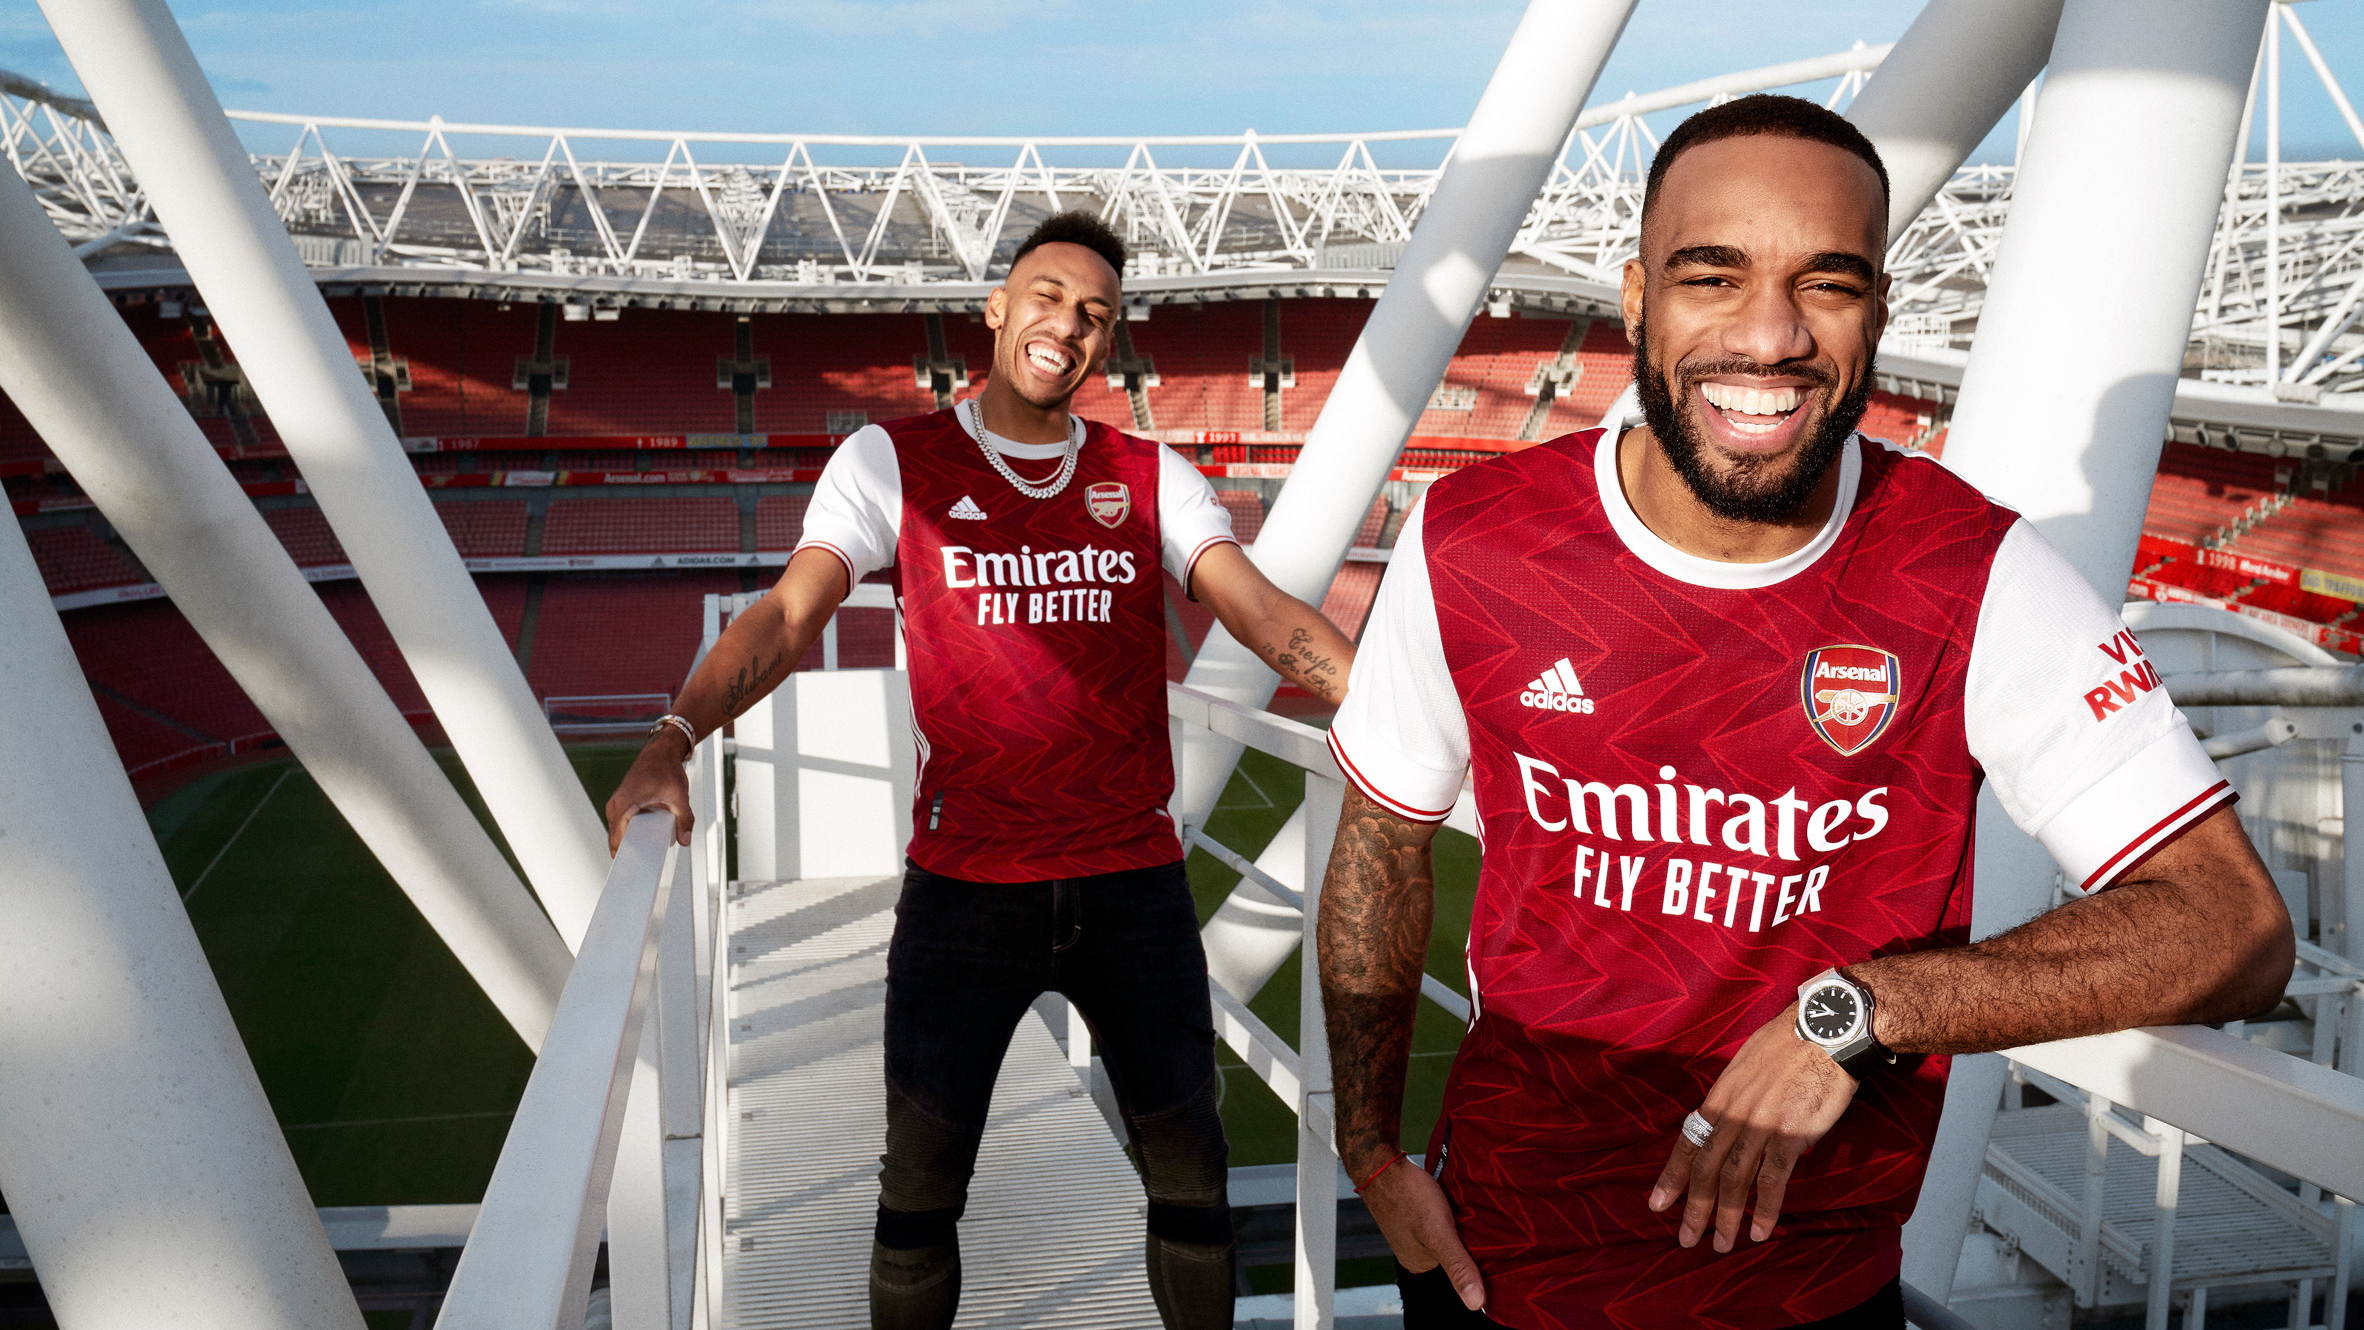 Arsenal S Unveils Chevron Covered Shirt For 2020 2021 Season